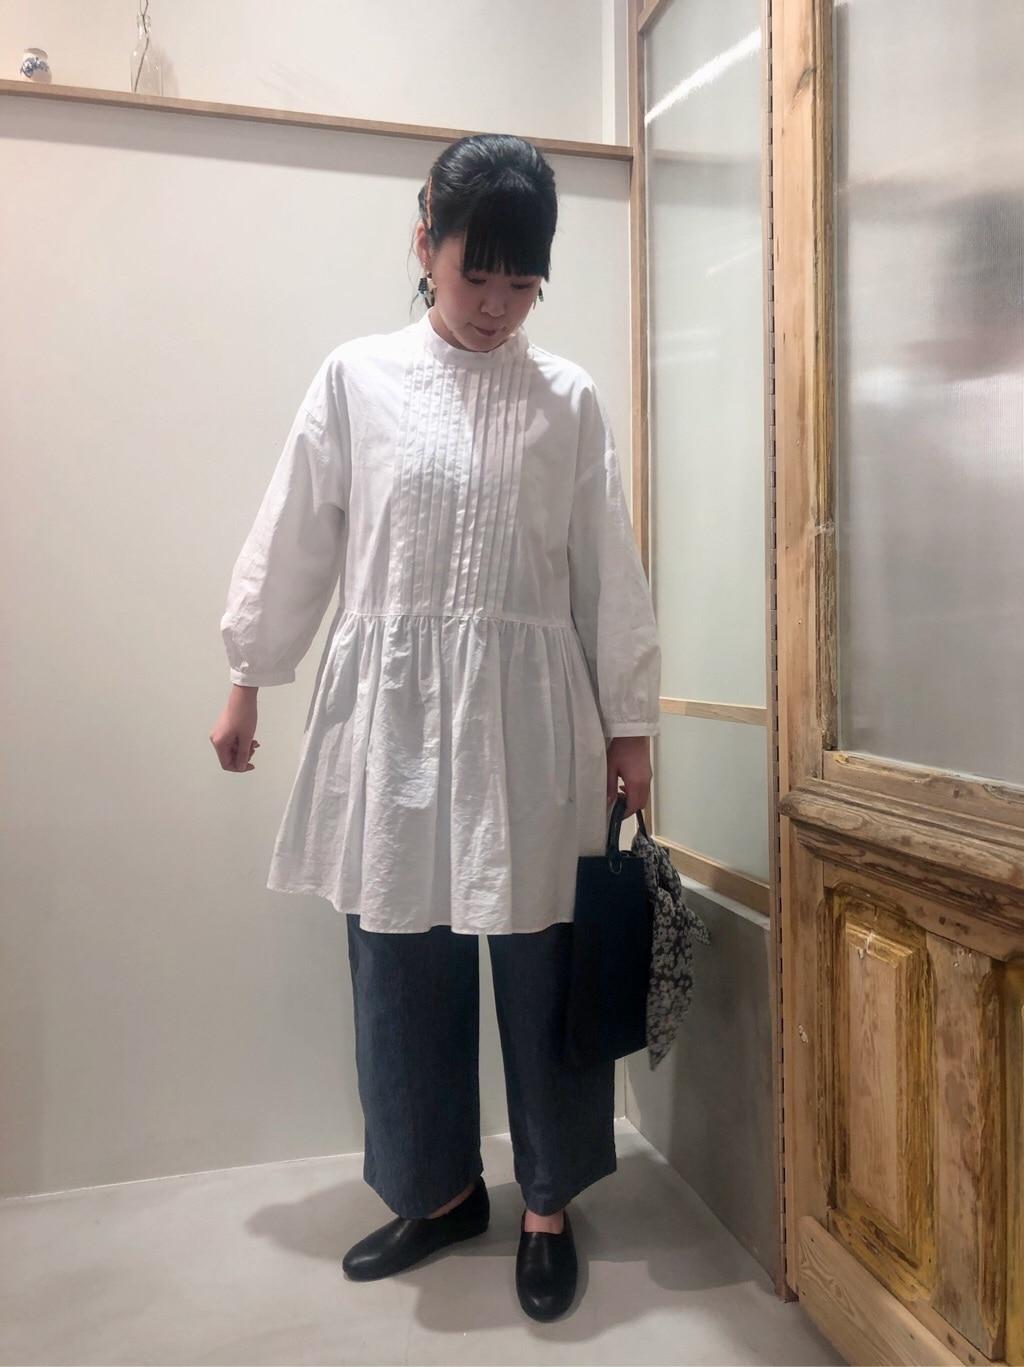 bulle de savon 渋谷スクランブルスクエア 身長:157cm 2020.02.13